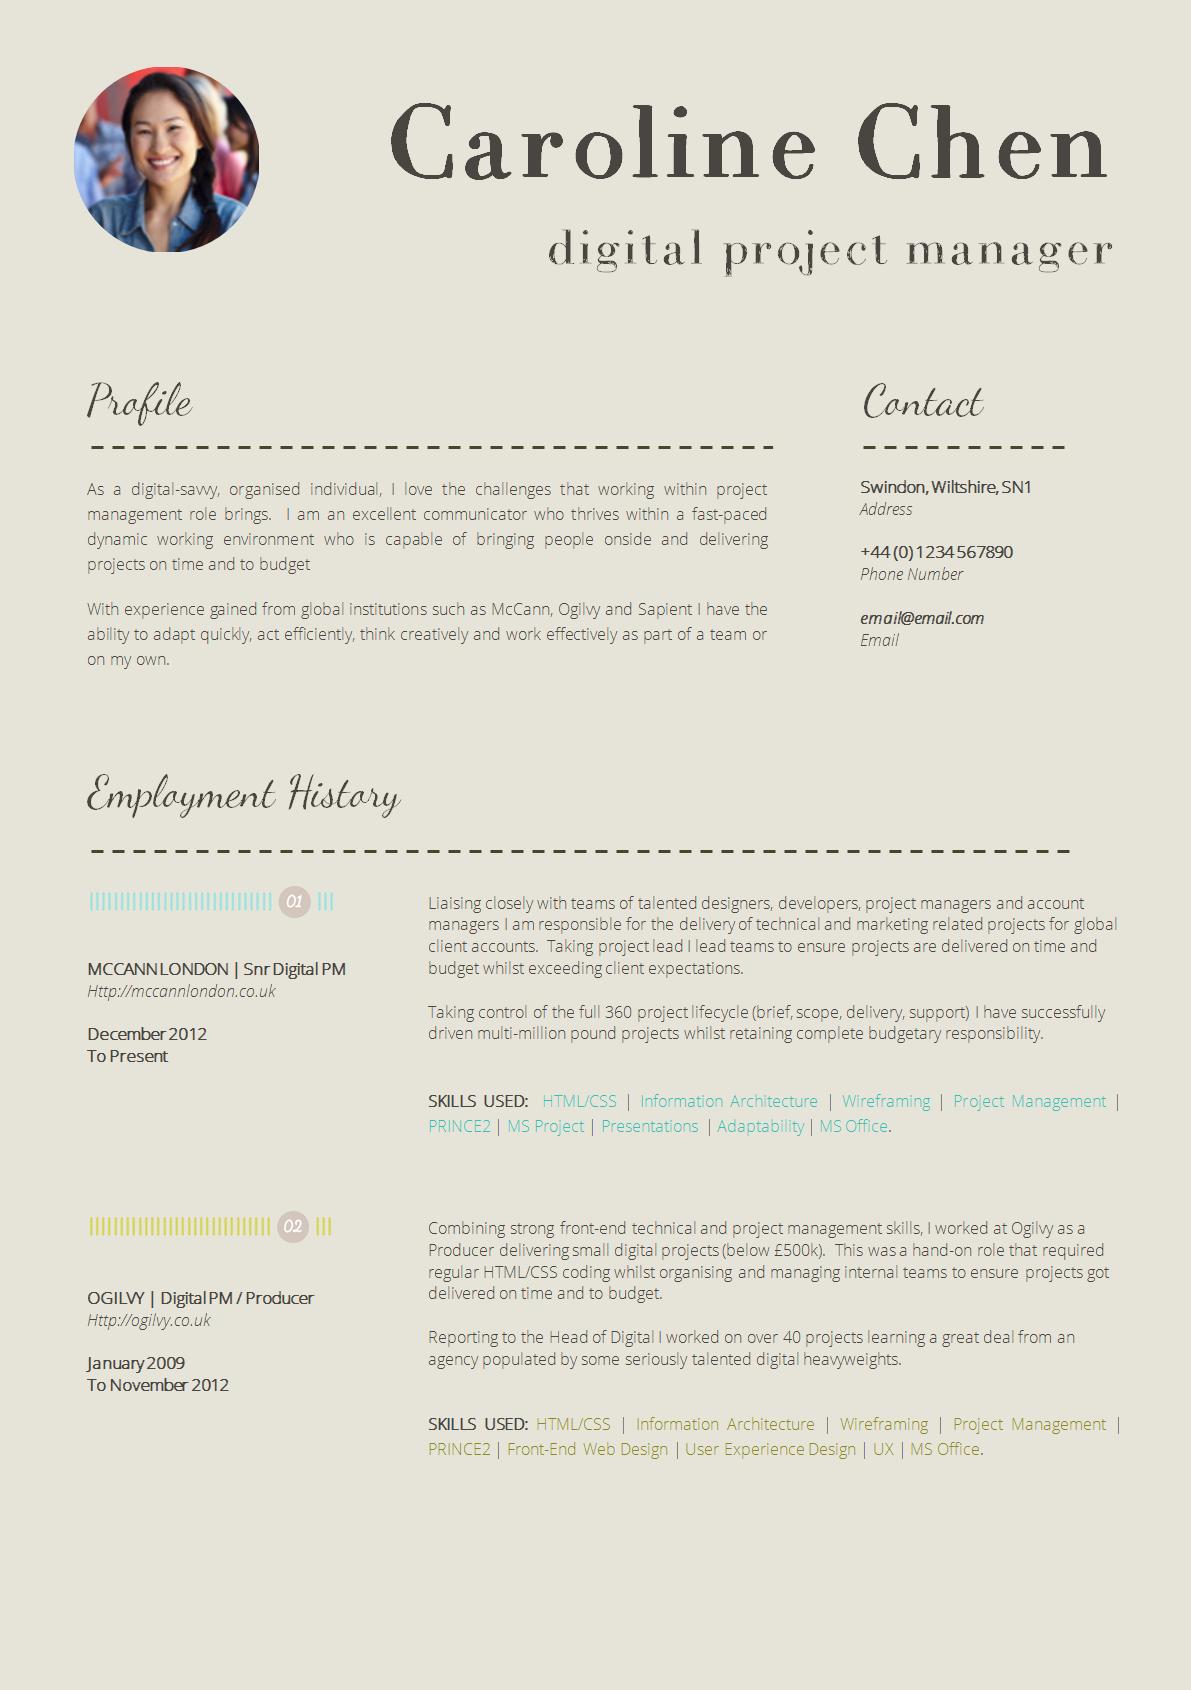 Cv Template Resume Template Professional Online Resume Template Cv Template